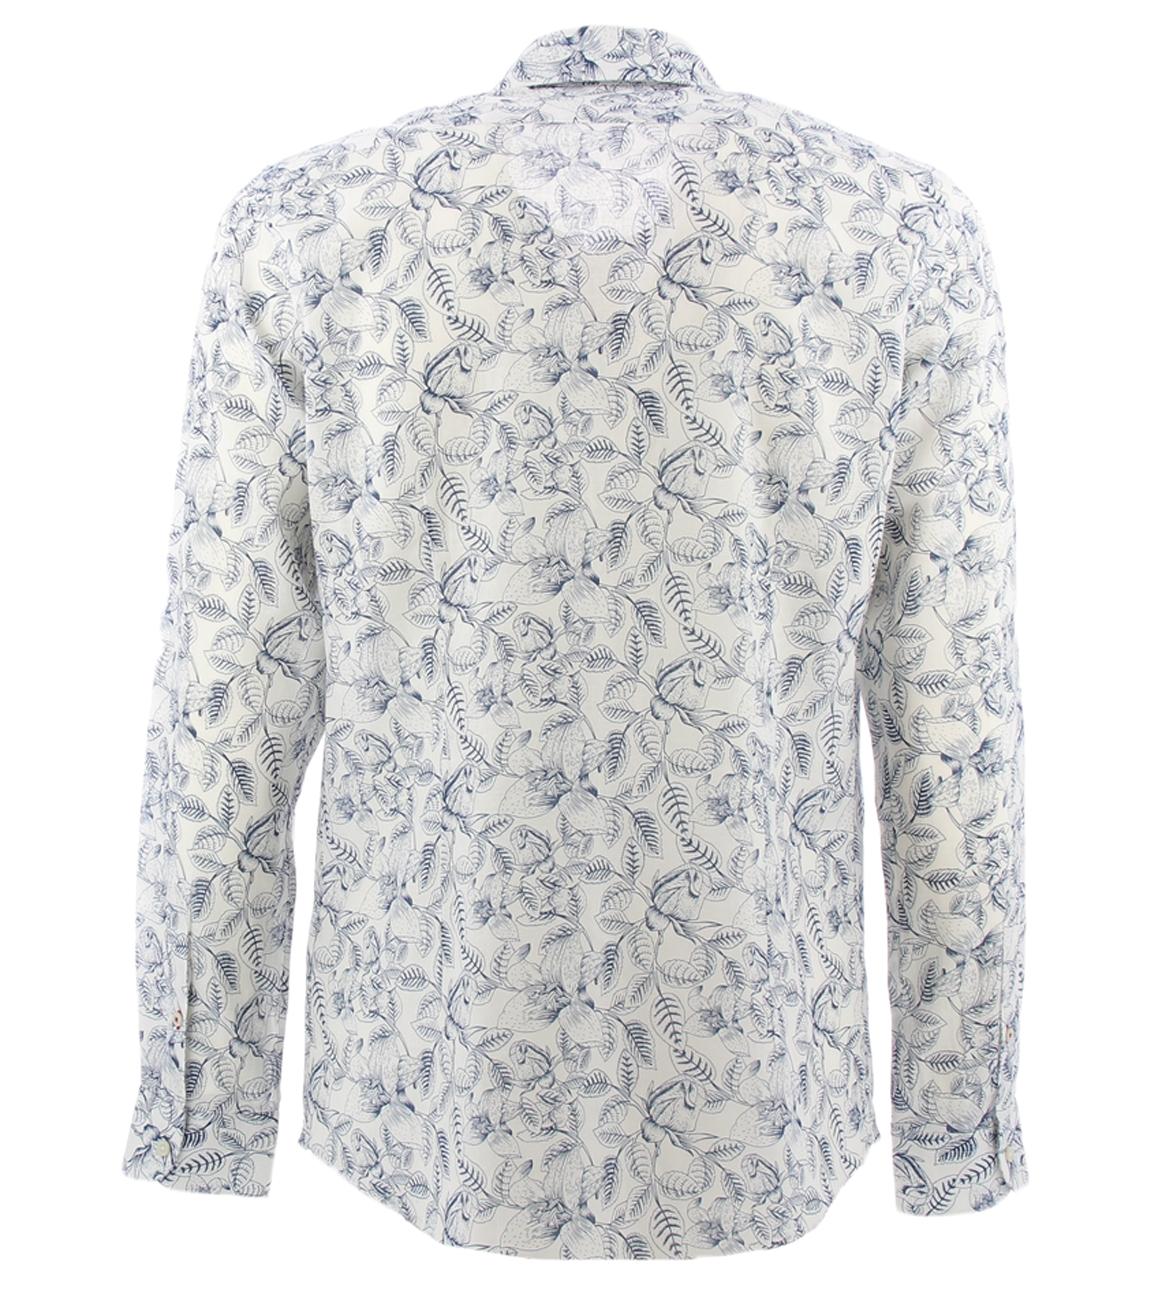 Indexbild 7 - Impure Hemden   1349 BIANCO